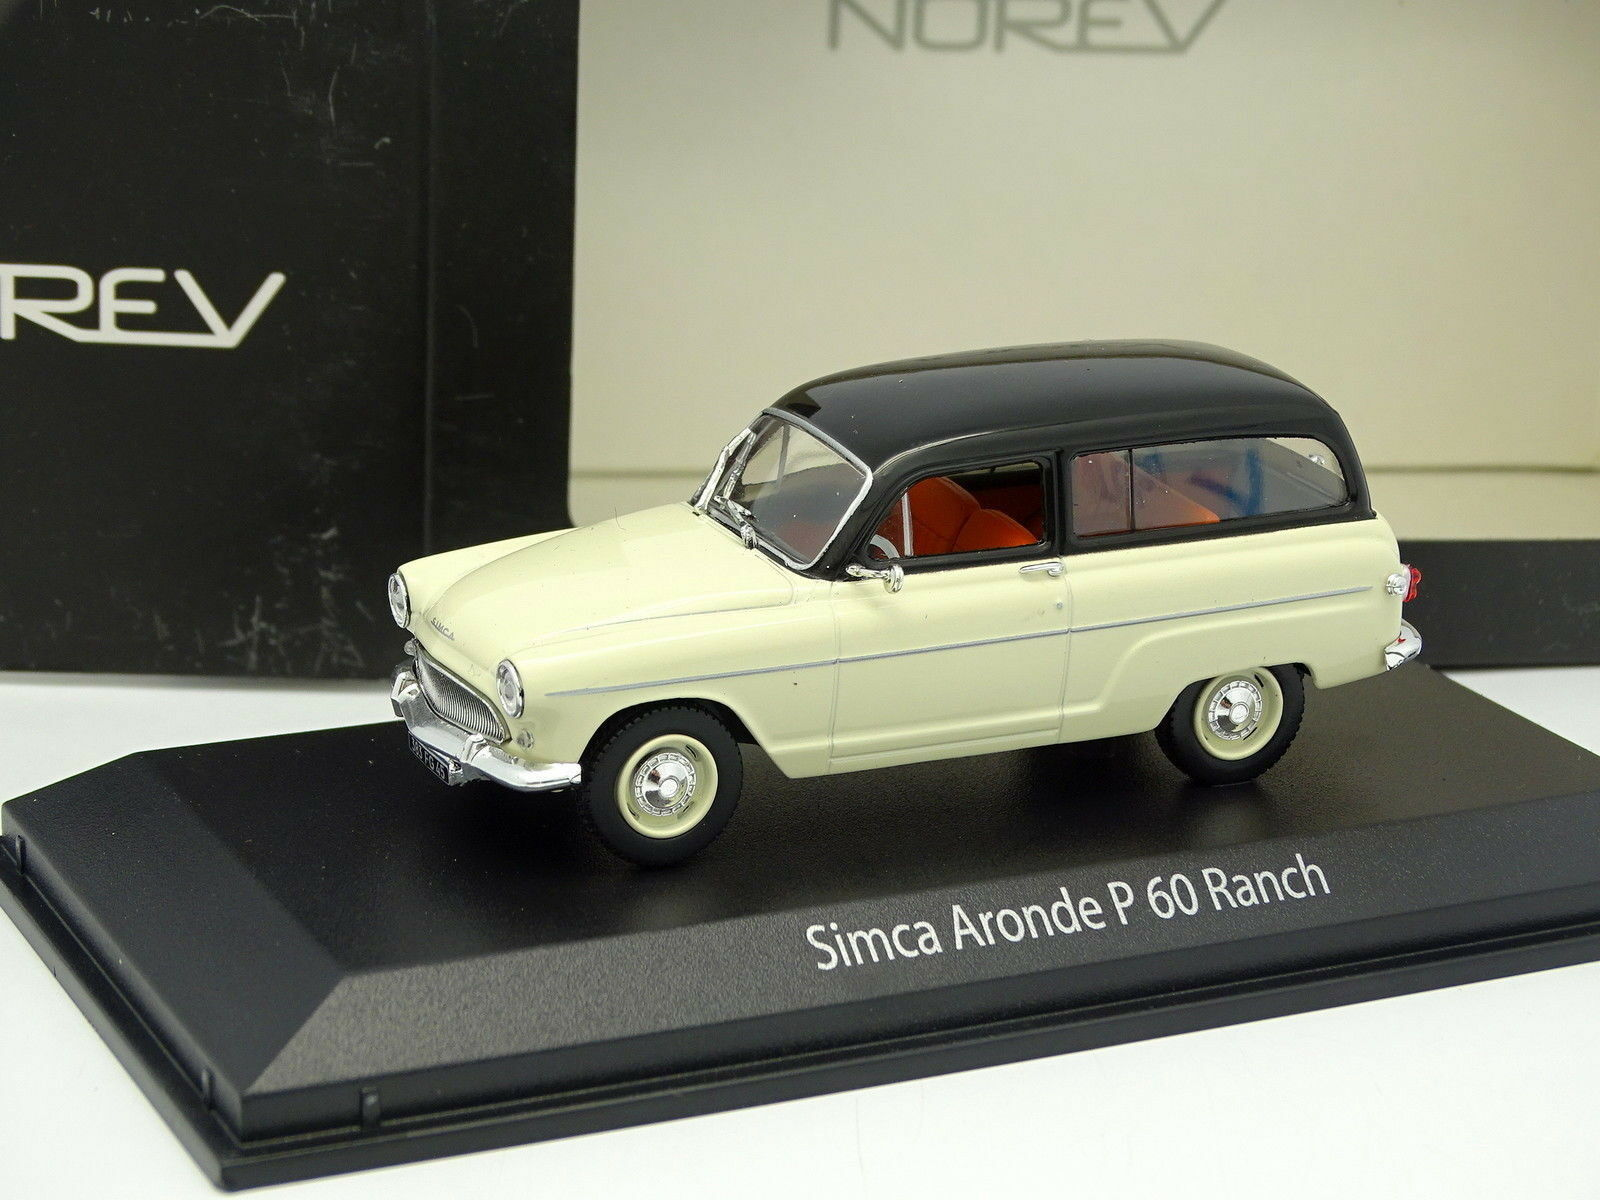 Norev 1 43 - Simca P60 Ranch white und black